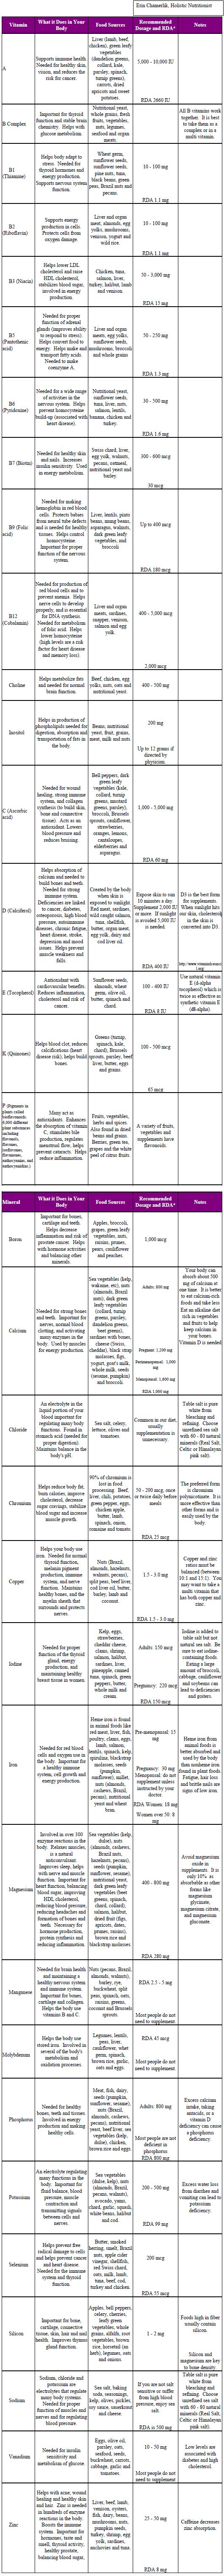 Vitamin & Mineral Chart | Living better at 50+| Online Womens Magazine